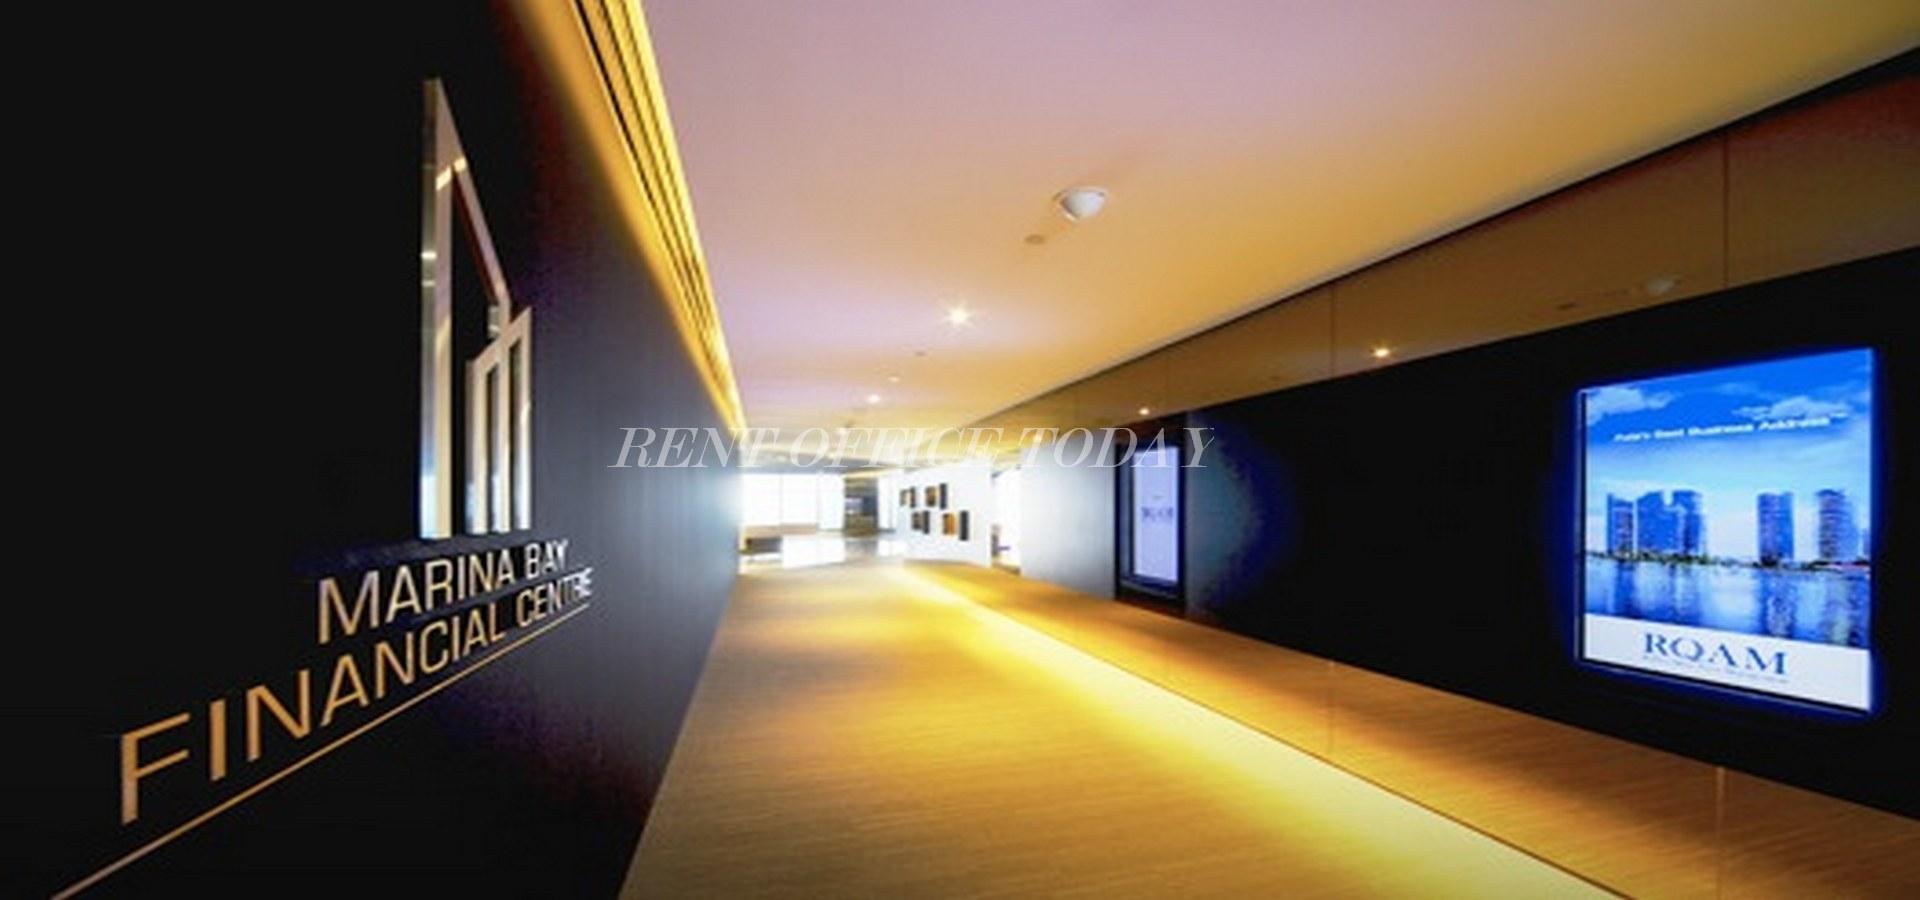 location de bureau marina bay financial centre-2